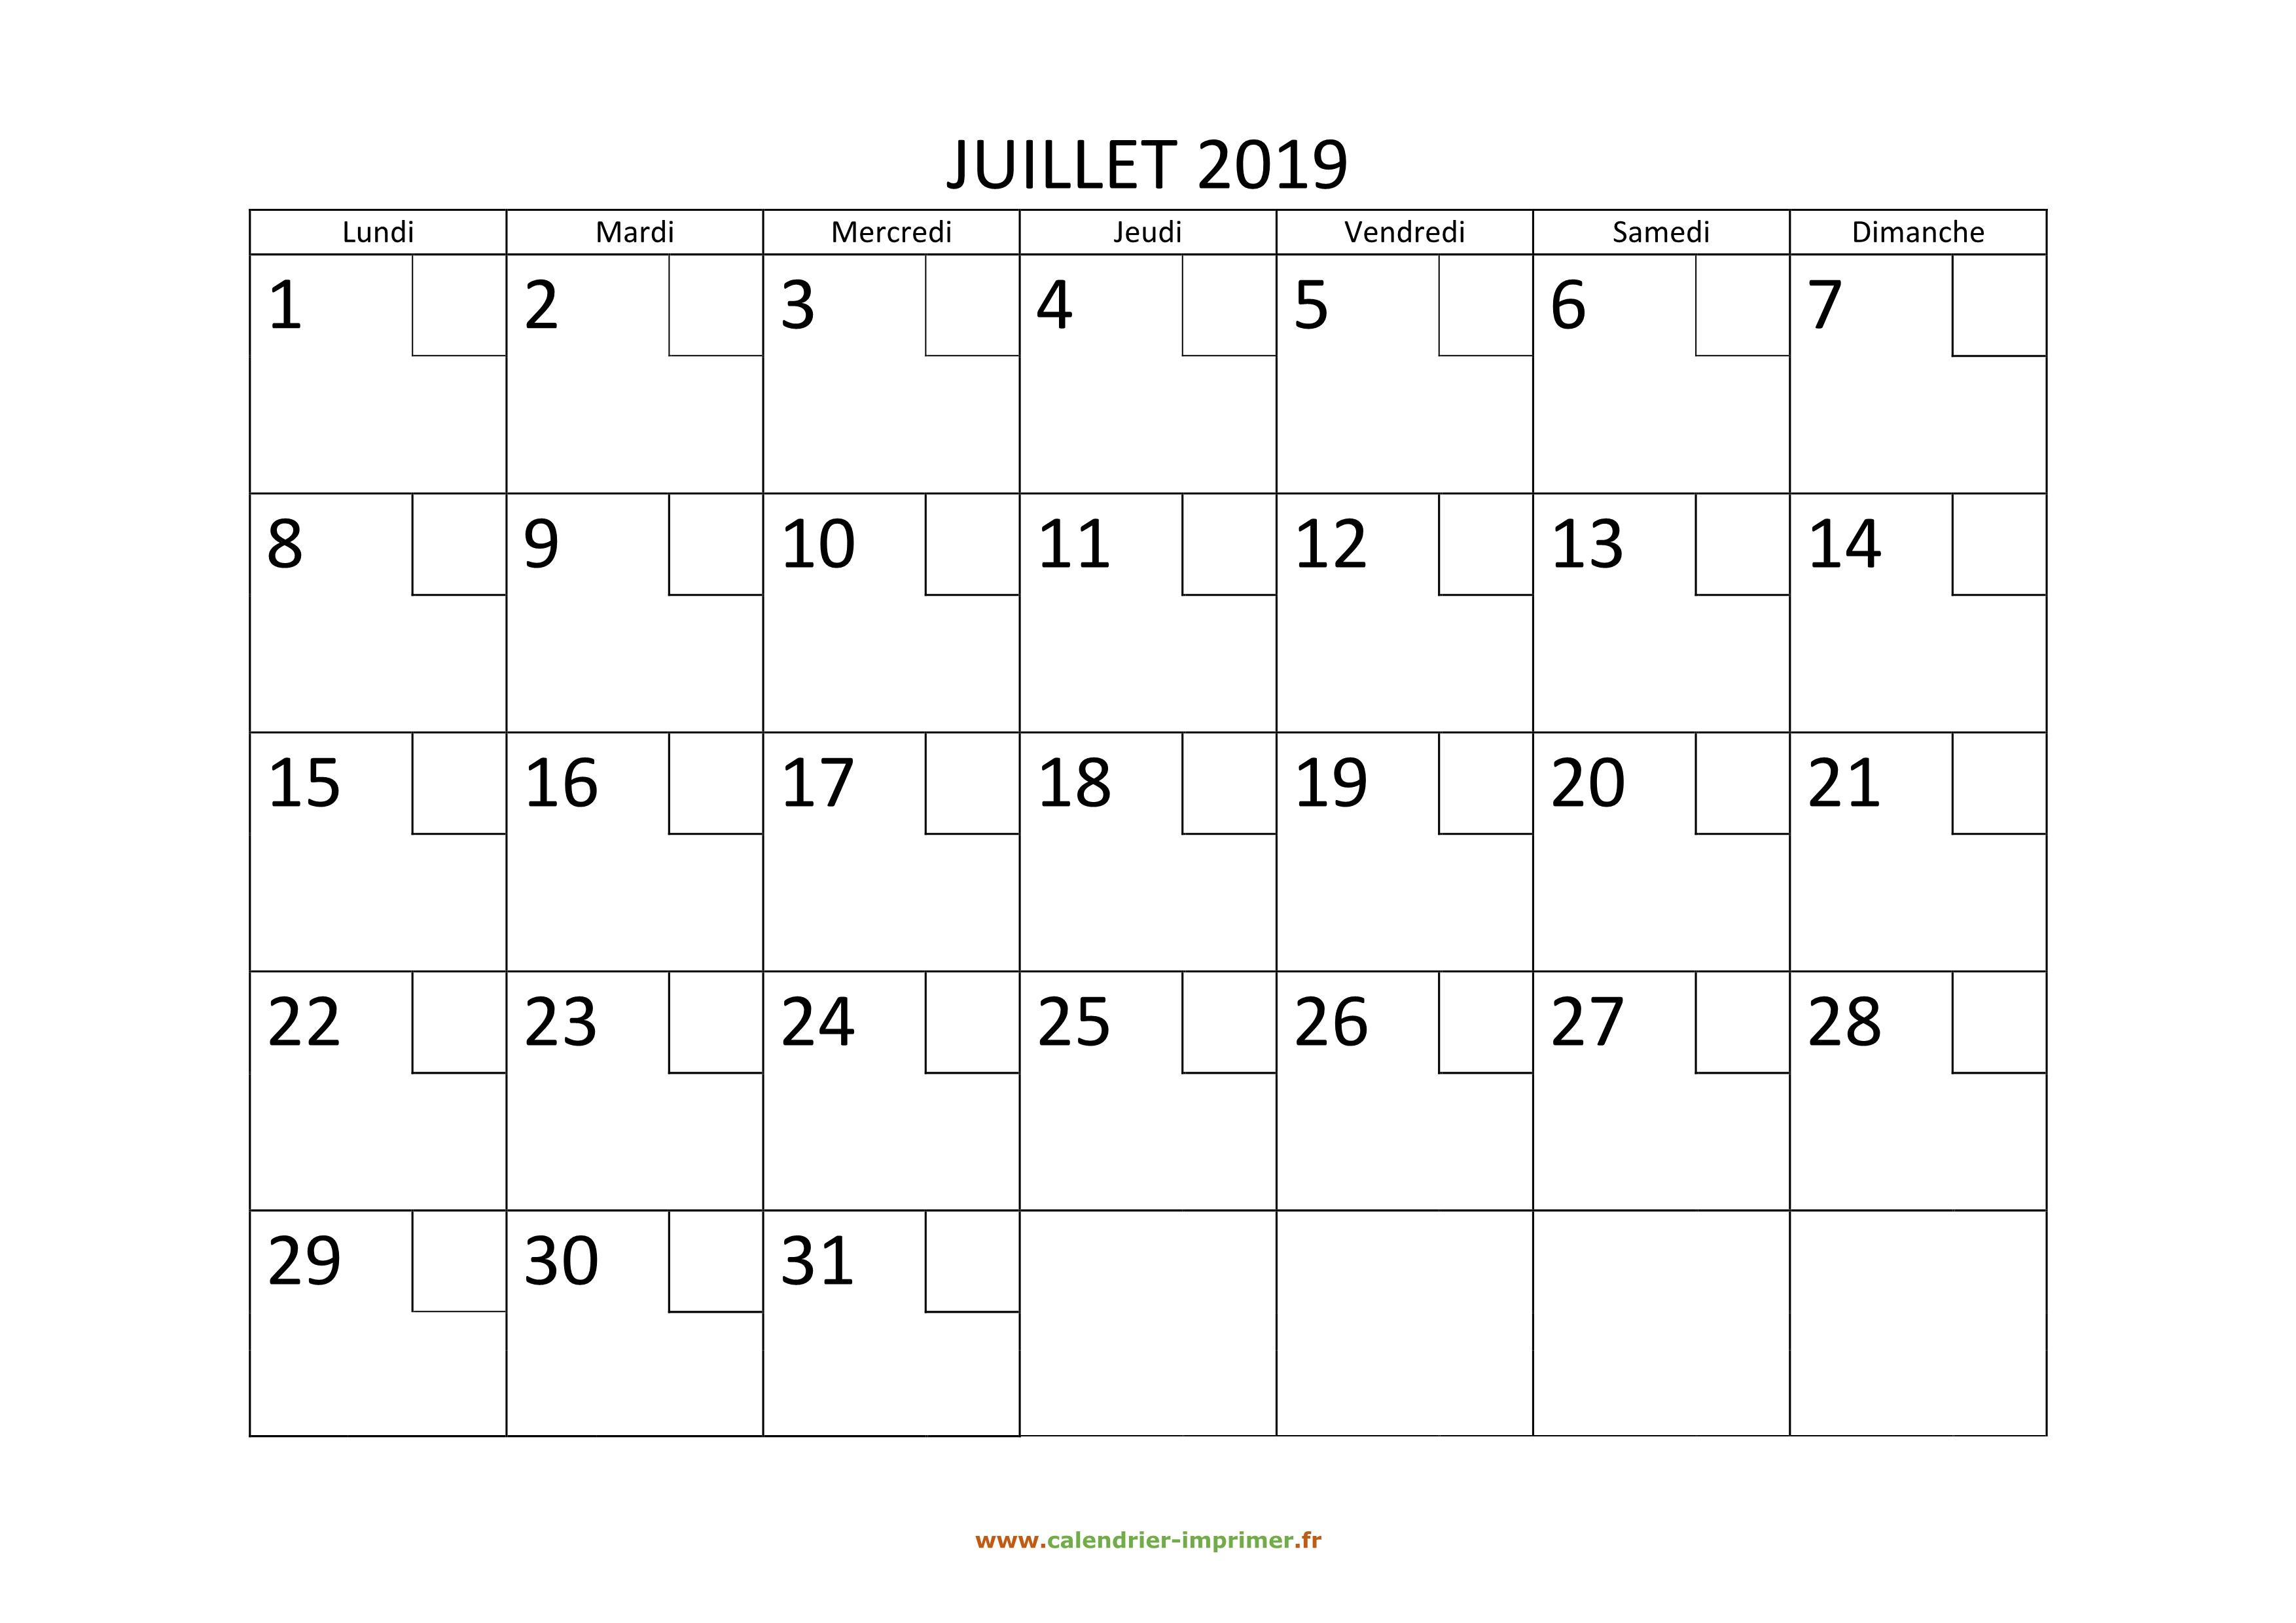 Calendrier A Imprimer Juillet 2019.Calendrier Juillet 2019 A Imprimer